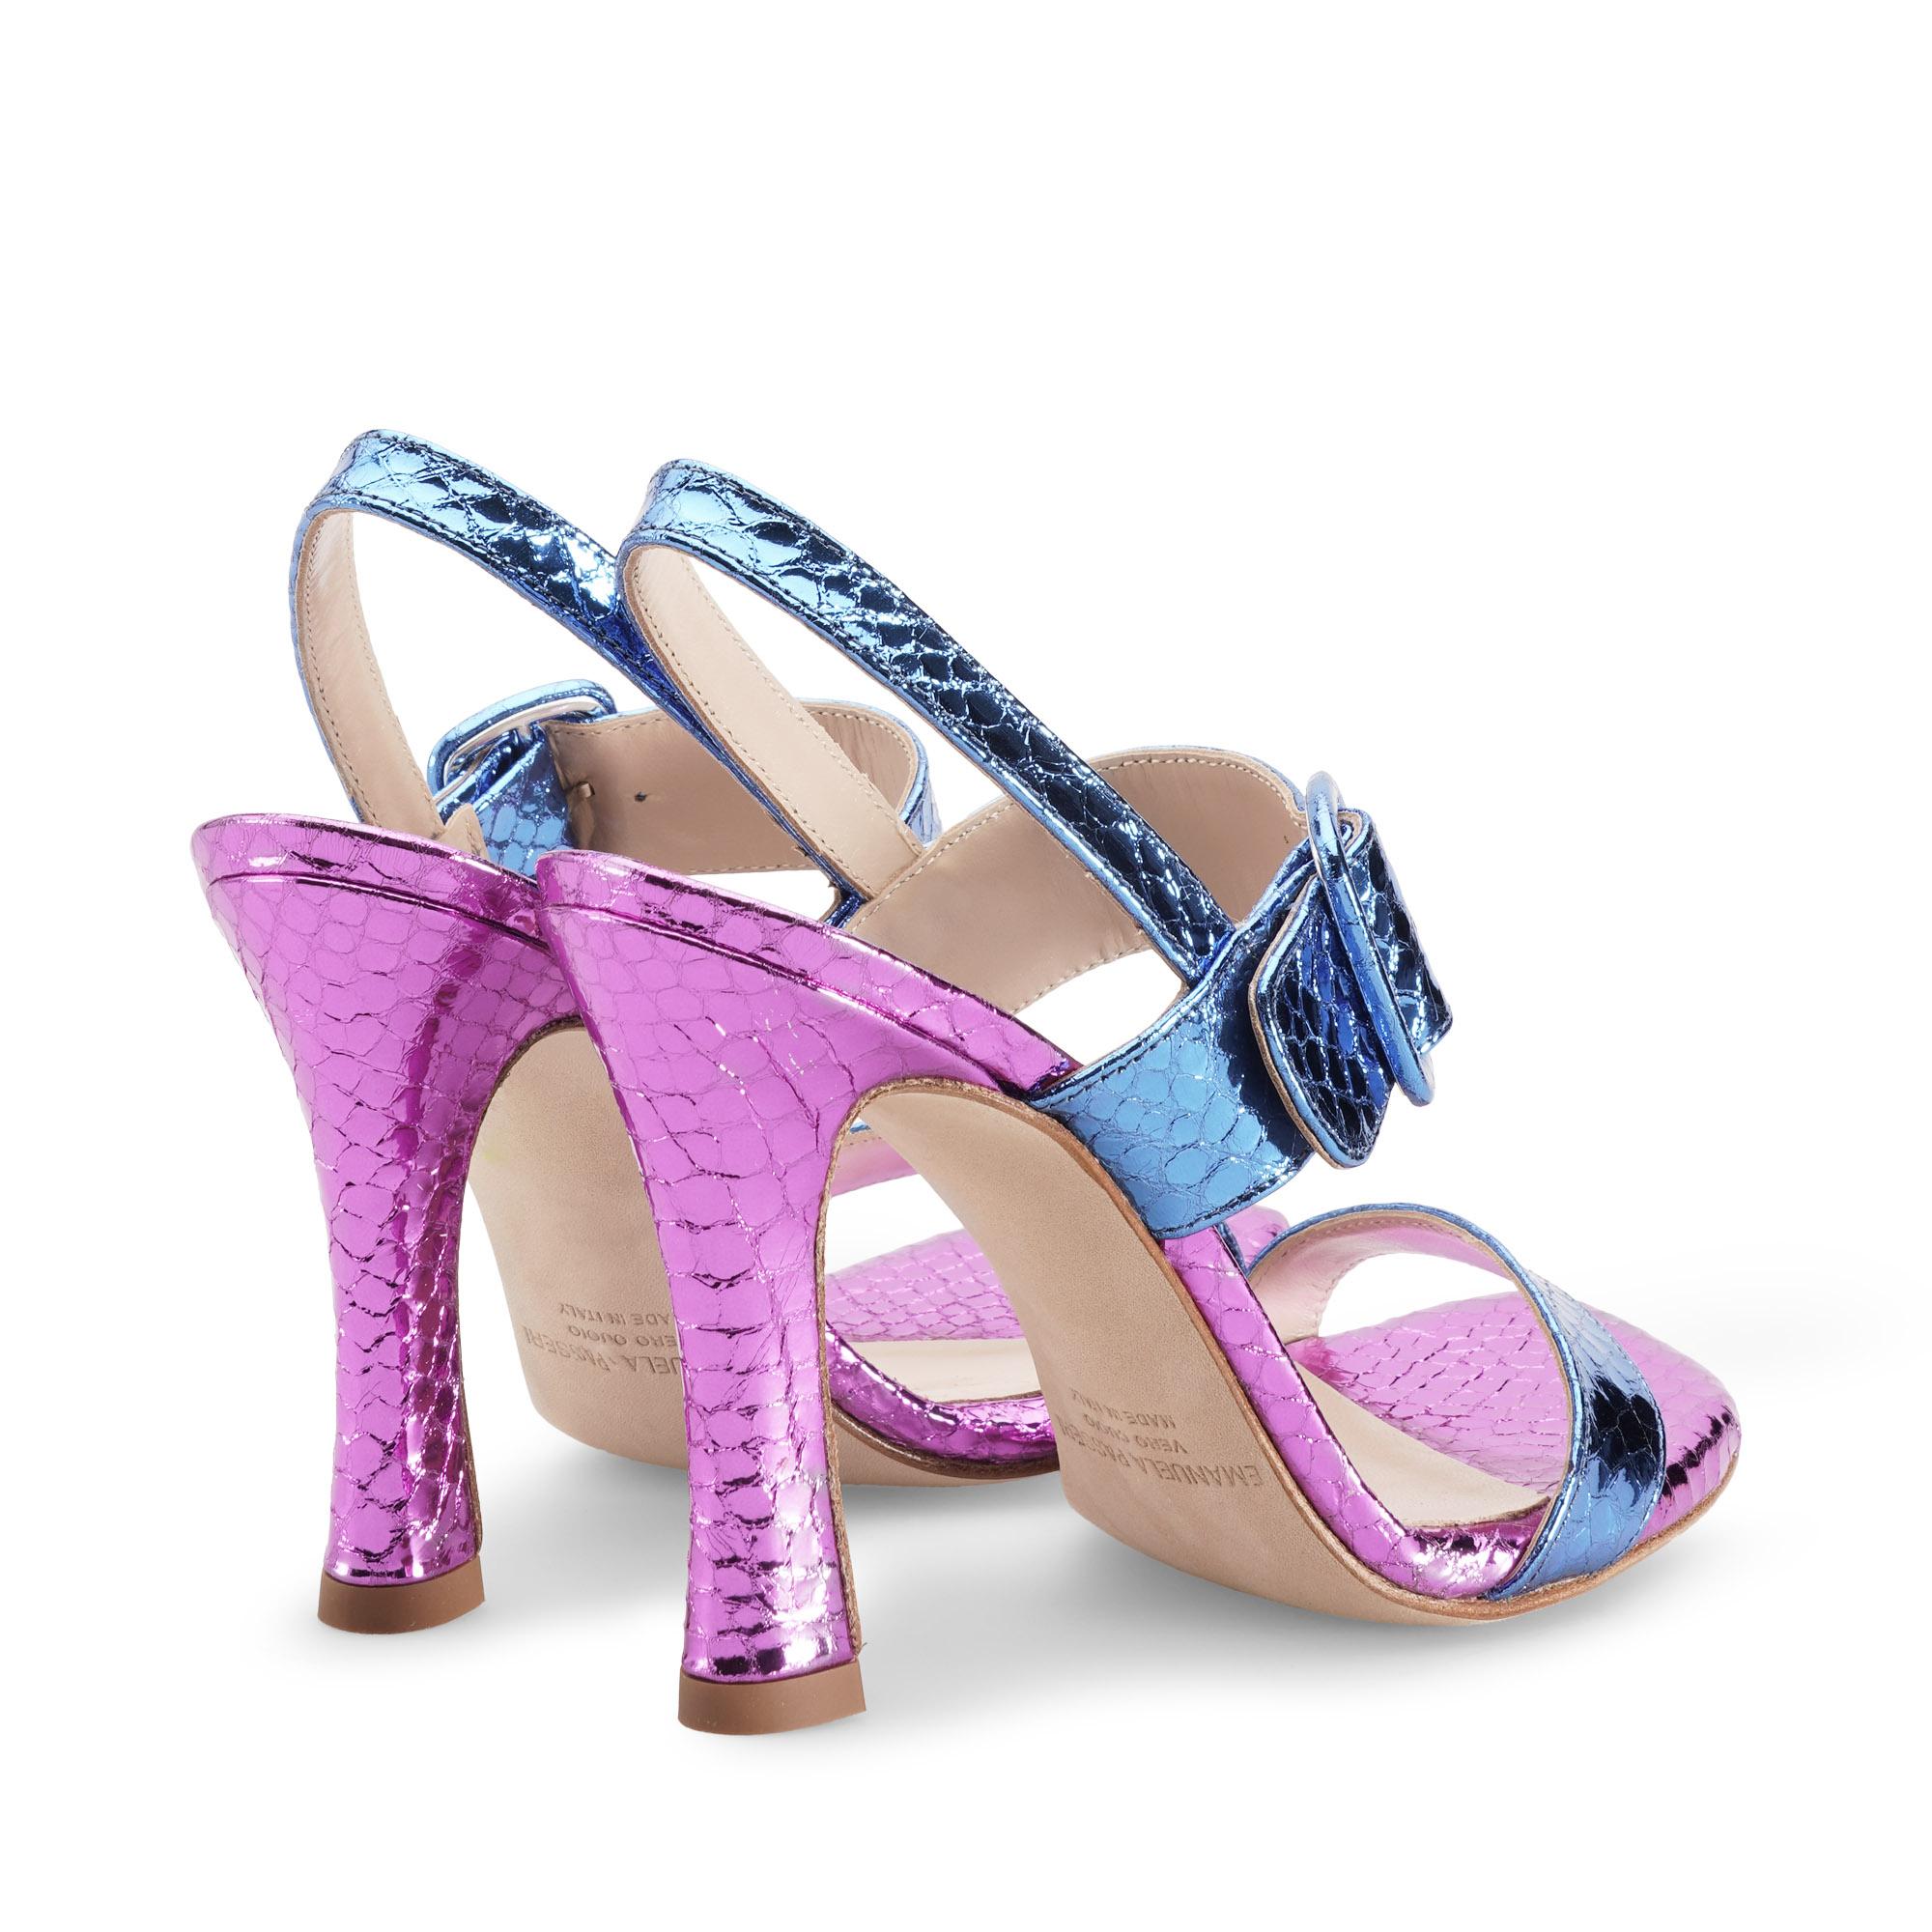 sandalo-donna-laminato-blu-fuxia-rosa-emanuela-passeri-shoes-heels-spring-summer-2021